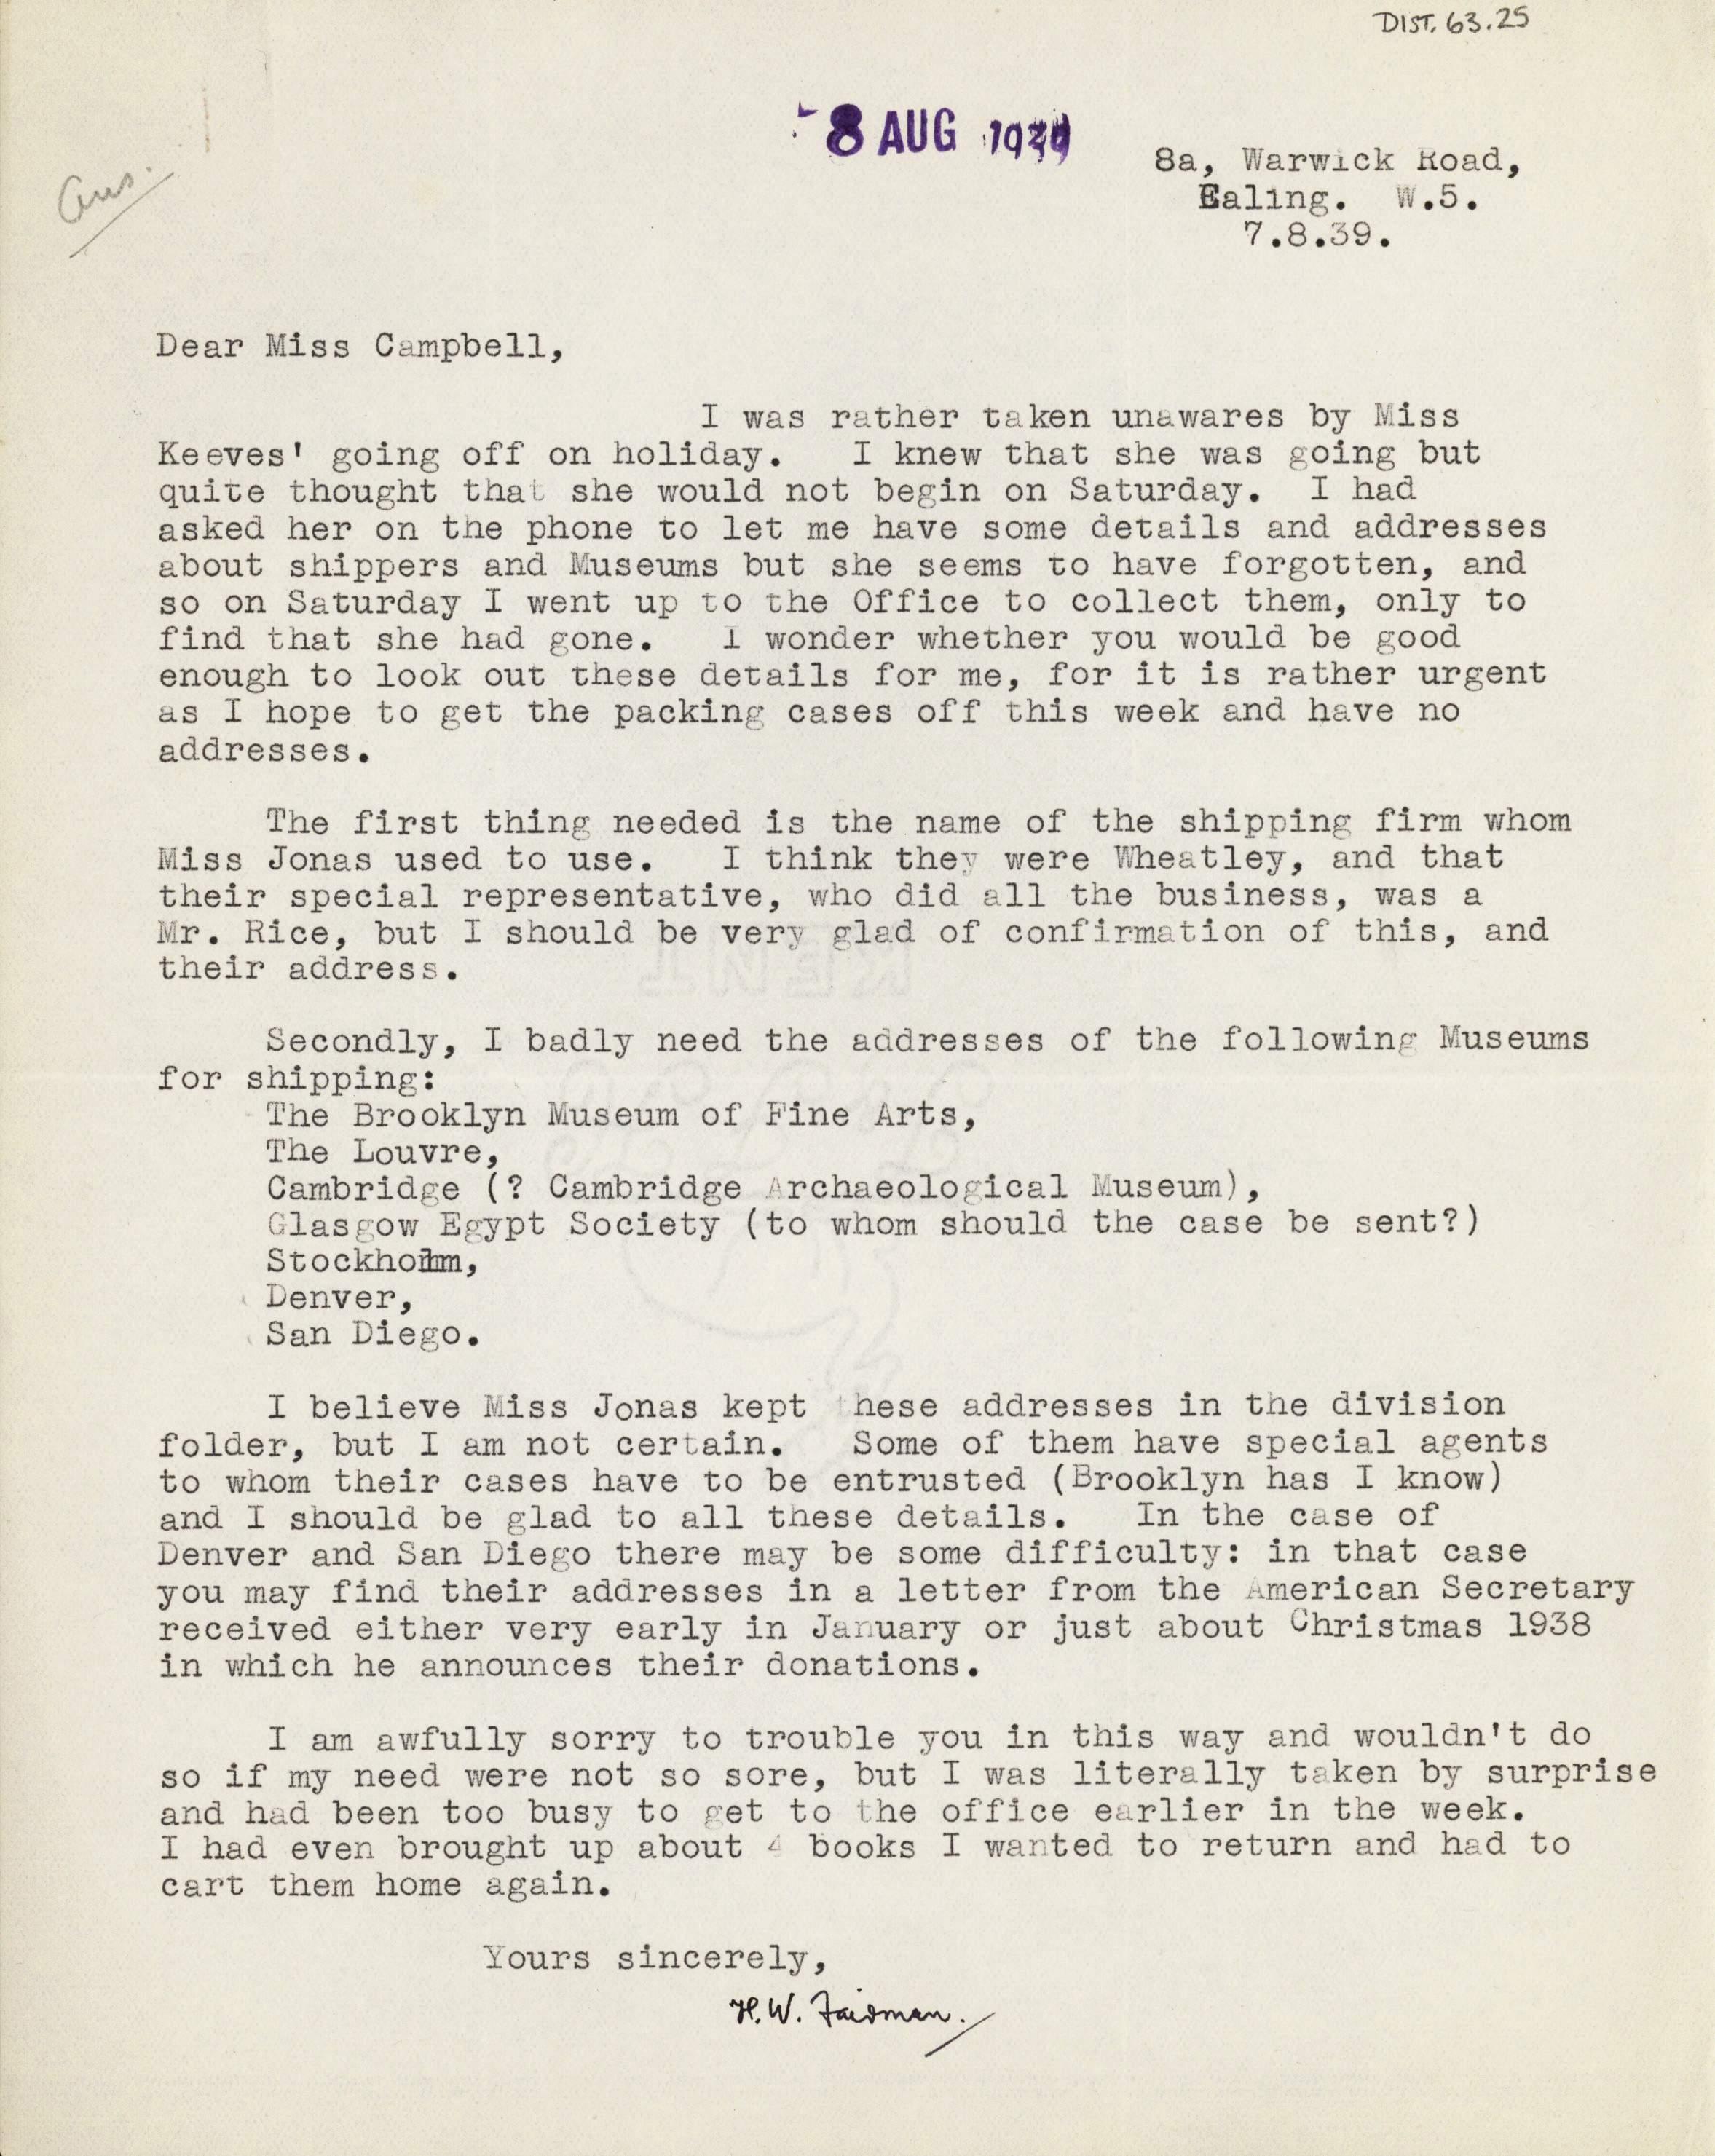 1936-39 Amarah West, Sesebi DIST.63.25